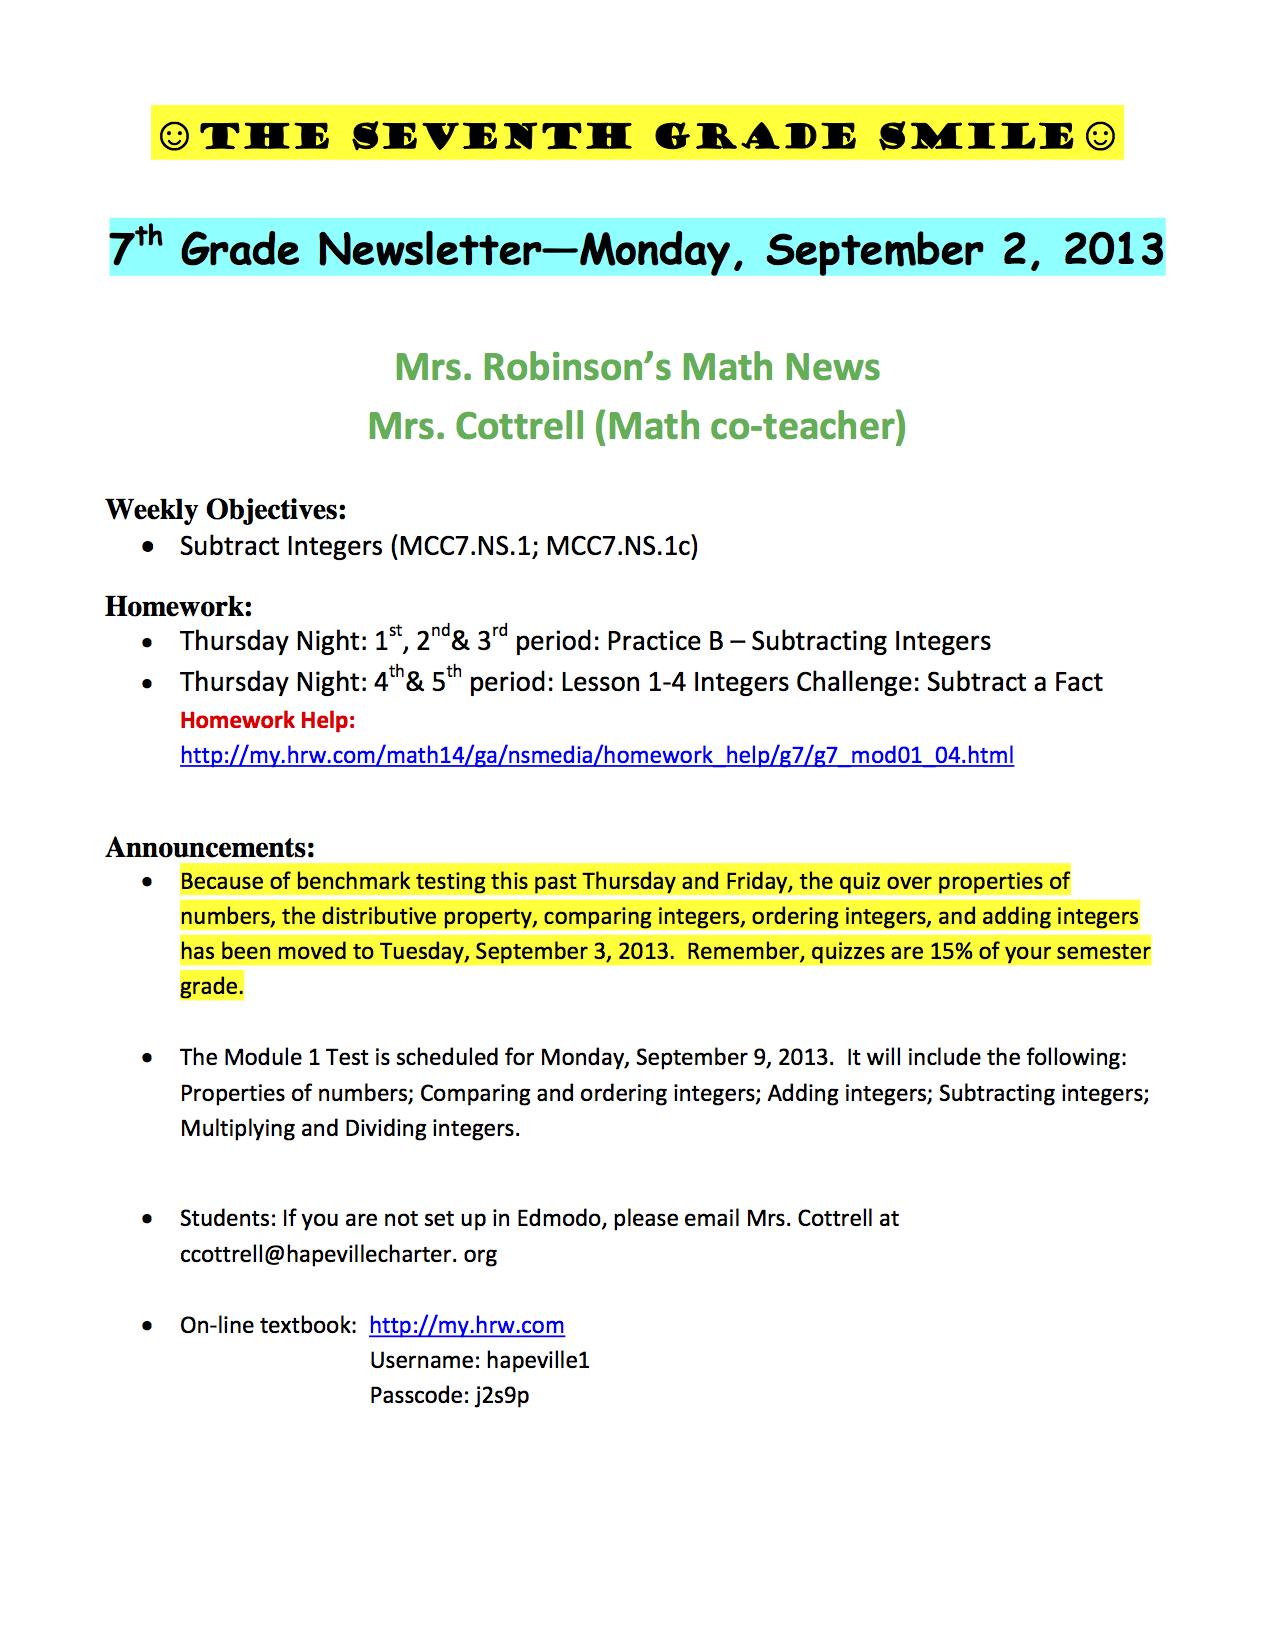 Newsletter for September 2 2013a.png